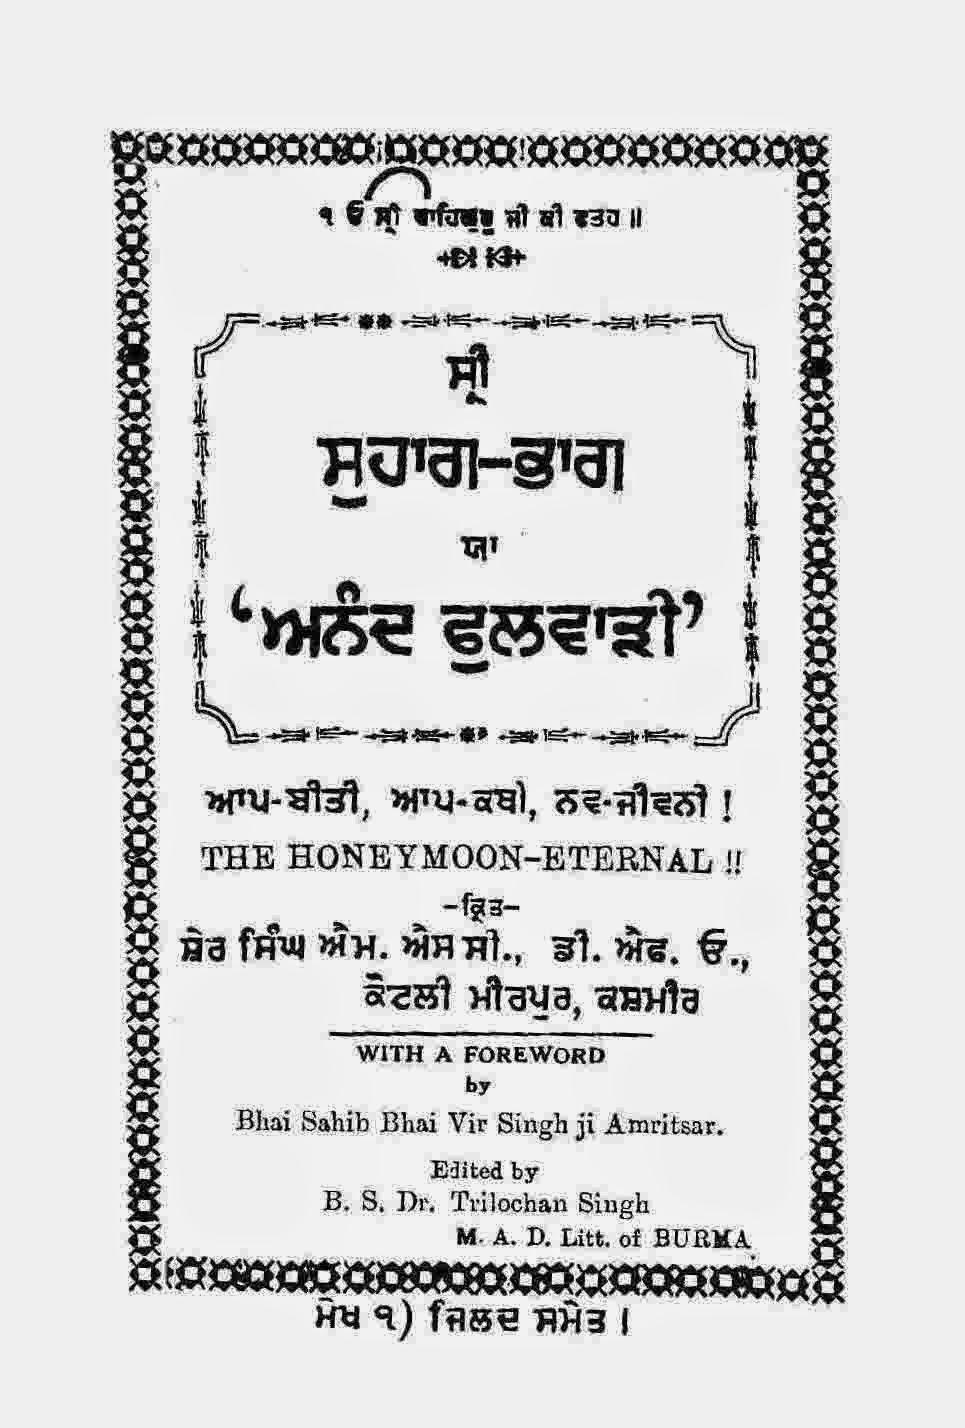 Sikh digital library celebrating the life and works of bhai sahib 10 name sikhan vich karigari di vidya di den fandeluxe Images